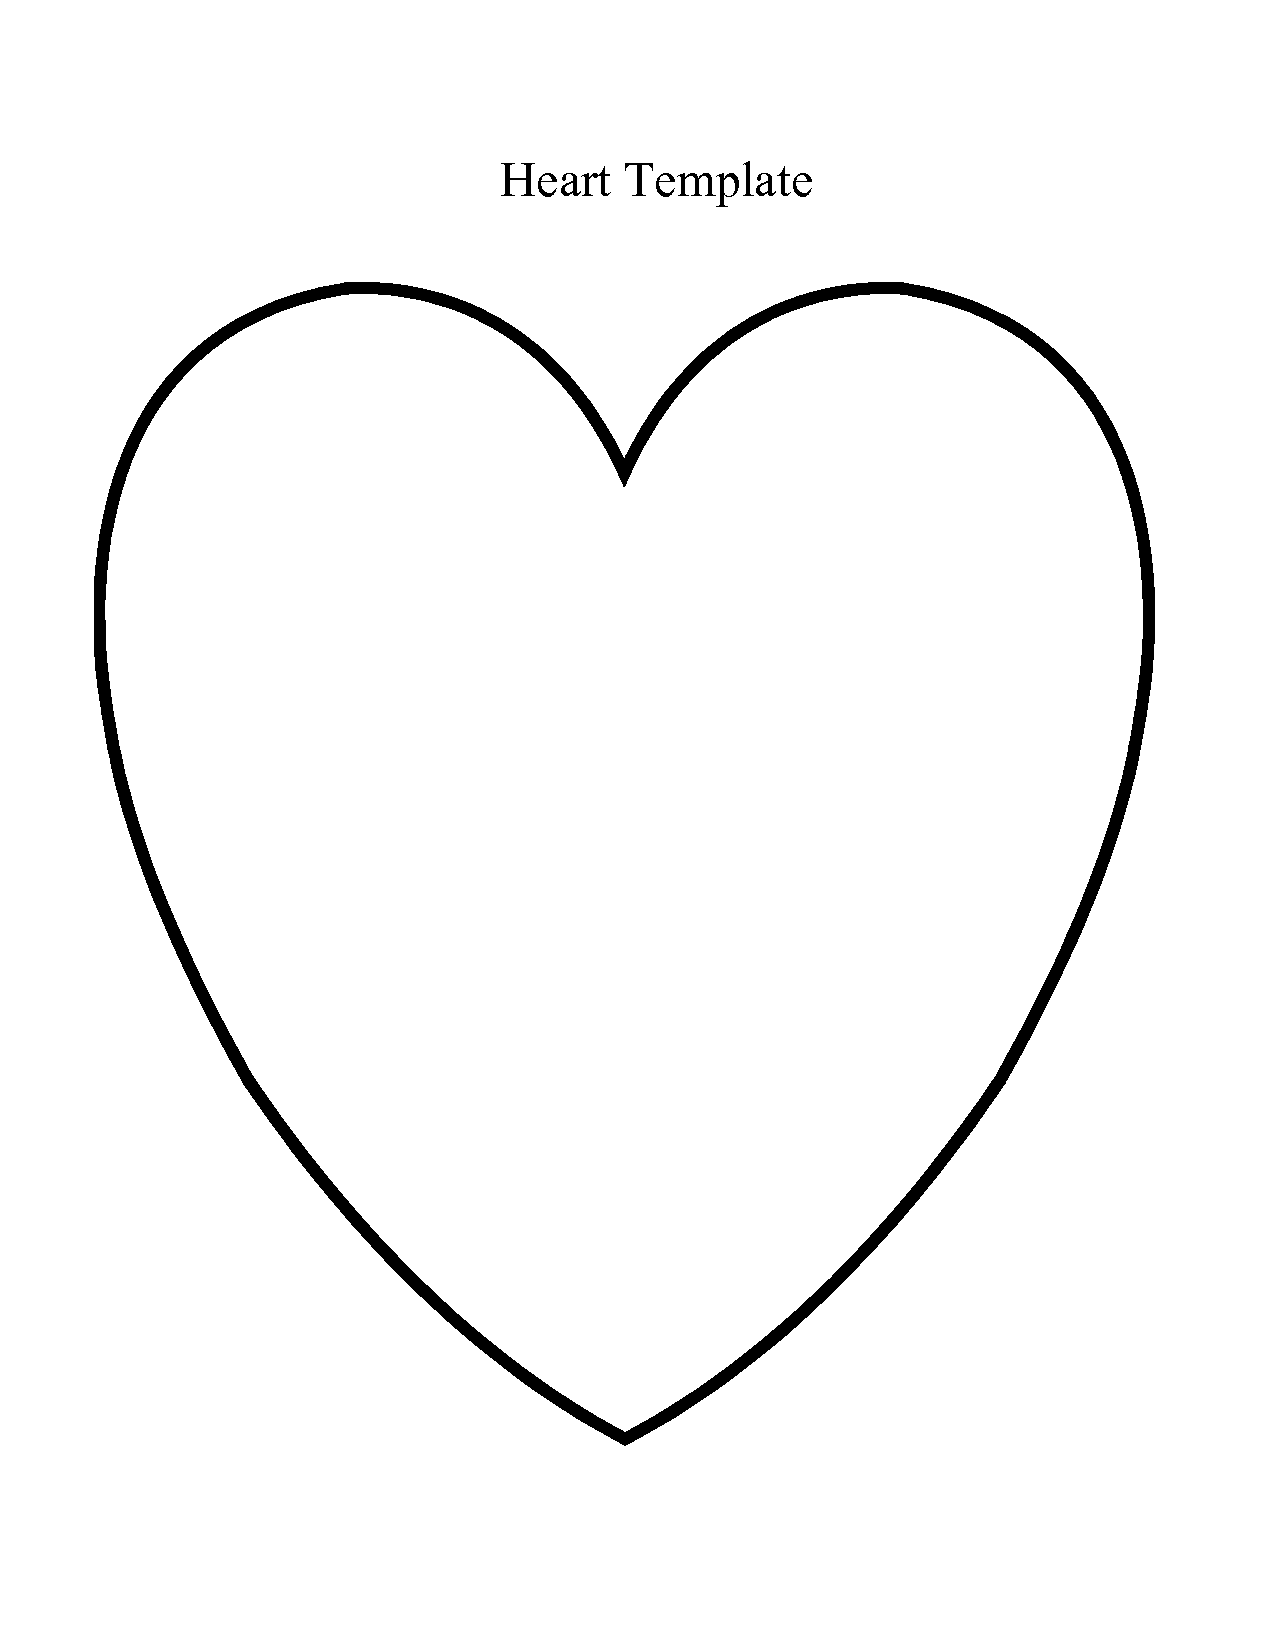 Line Drawing Heart Shape : Printable heart shape template clipart best